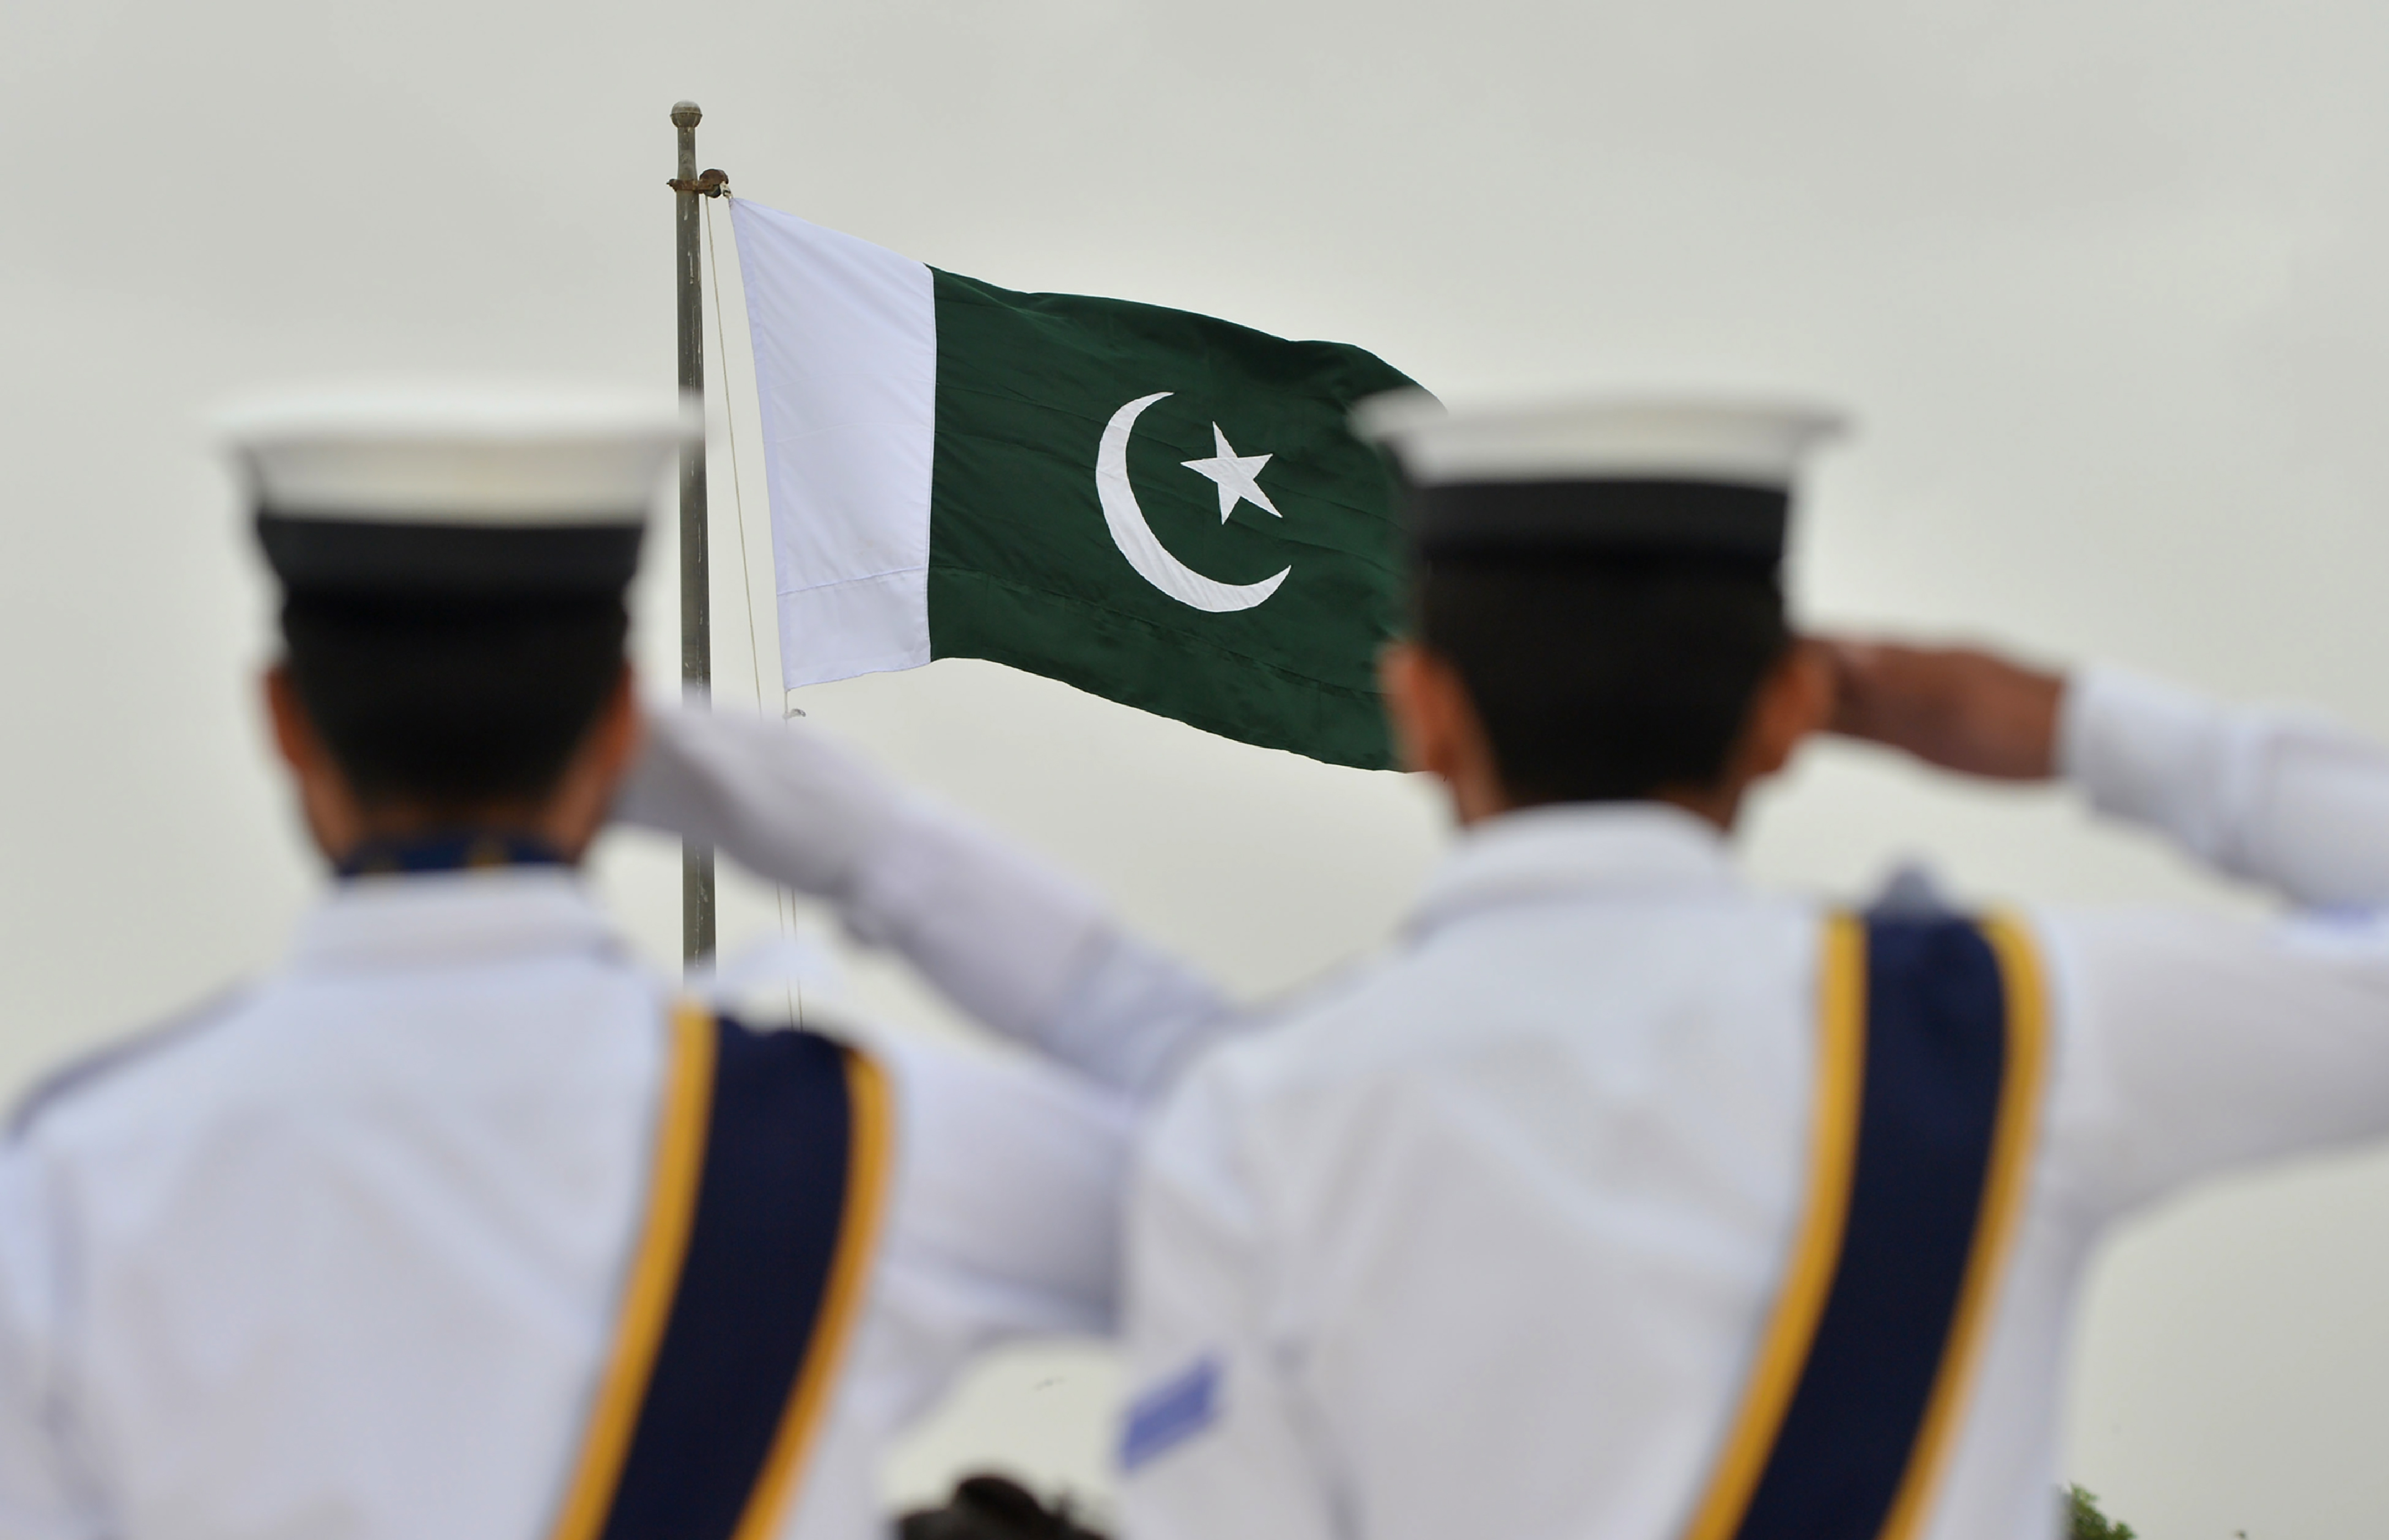 Pakistan celebrates Independence Day amid surge of democratic hope